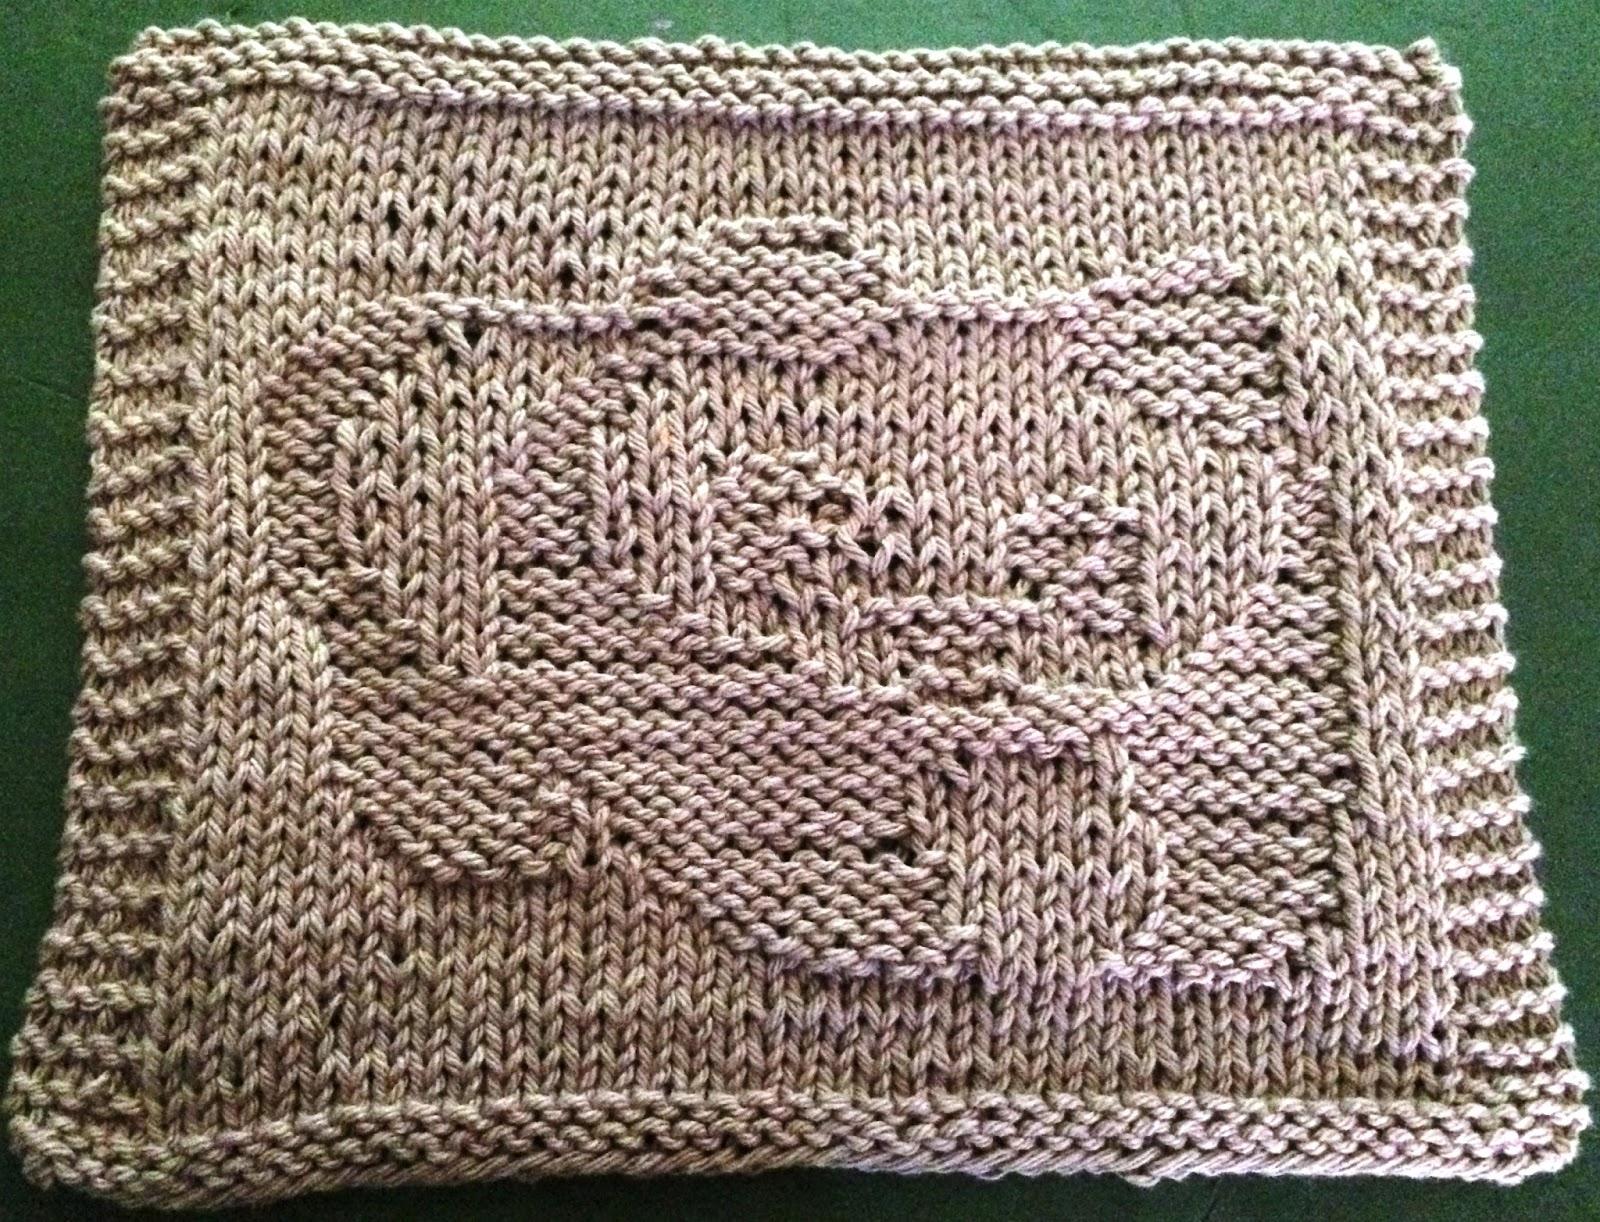 Knitted Teddy Bear Dishcloth Pattern : DigKnitty Designs: Another Panda Bear Knit Dishcloth Pattern